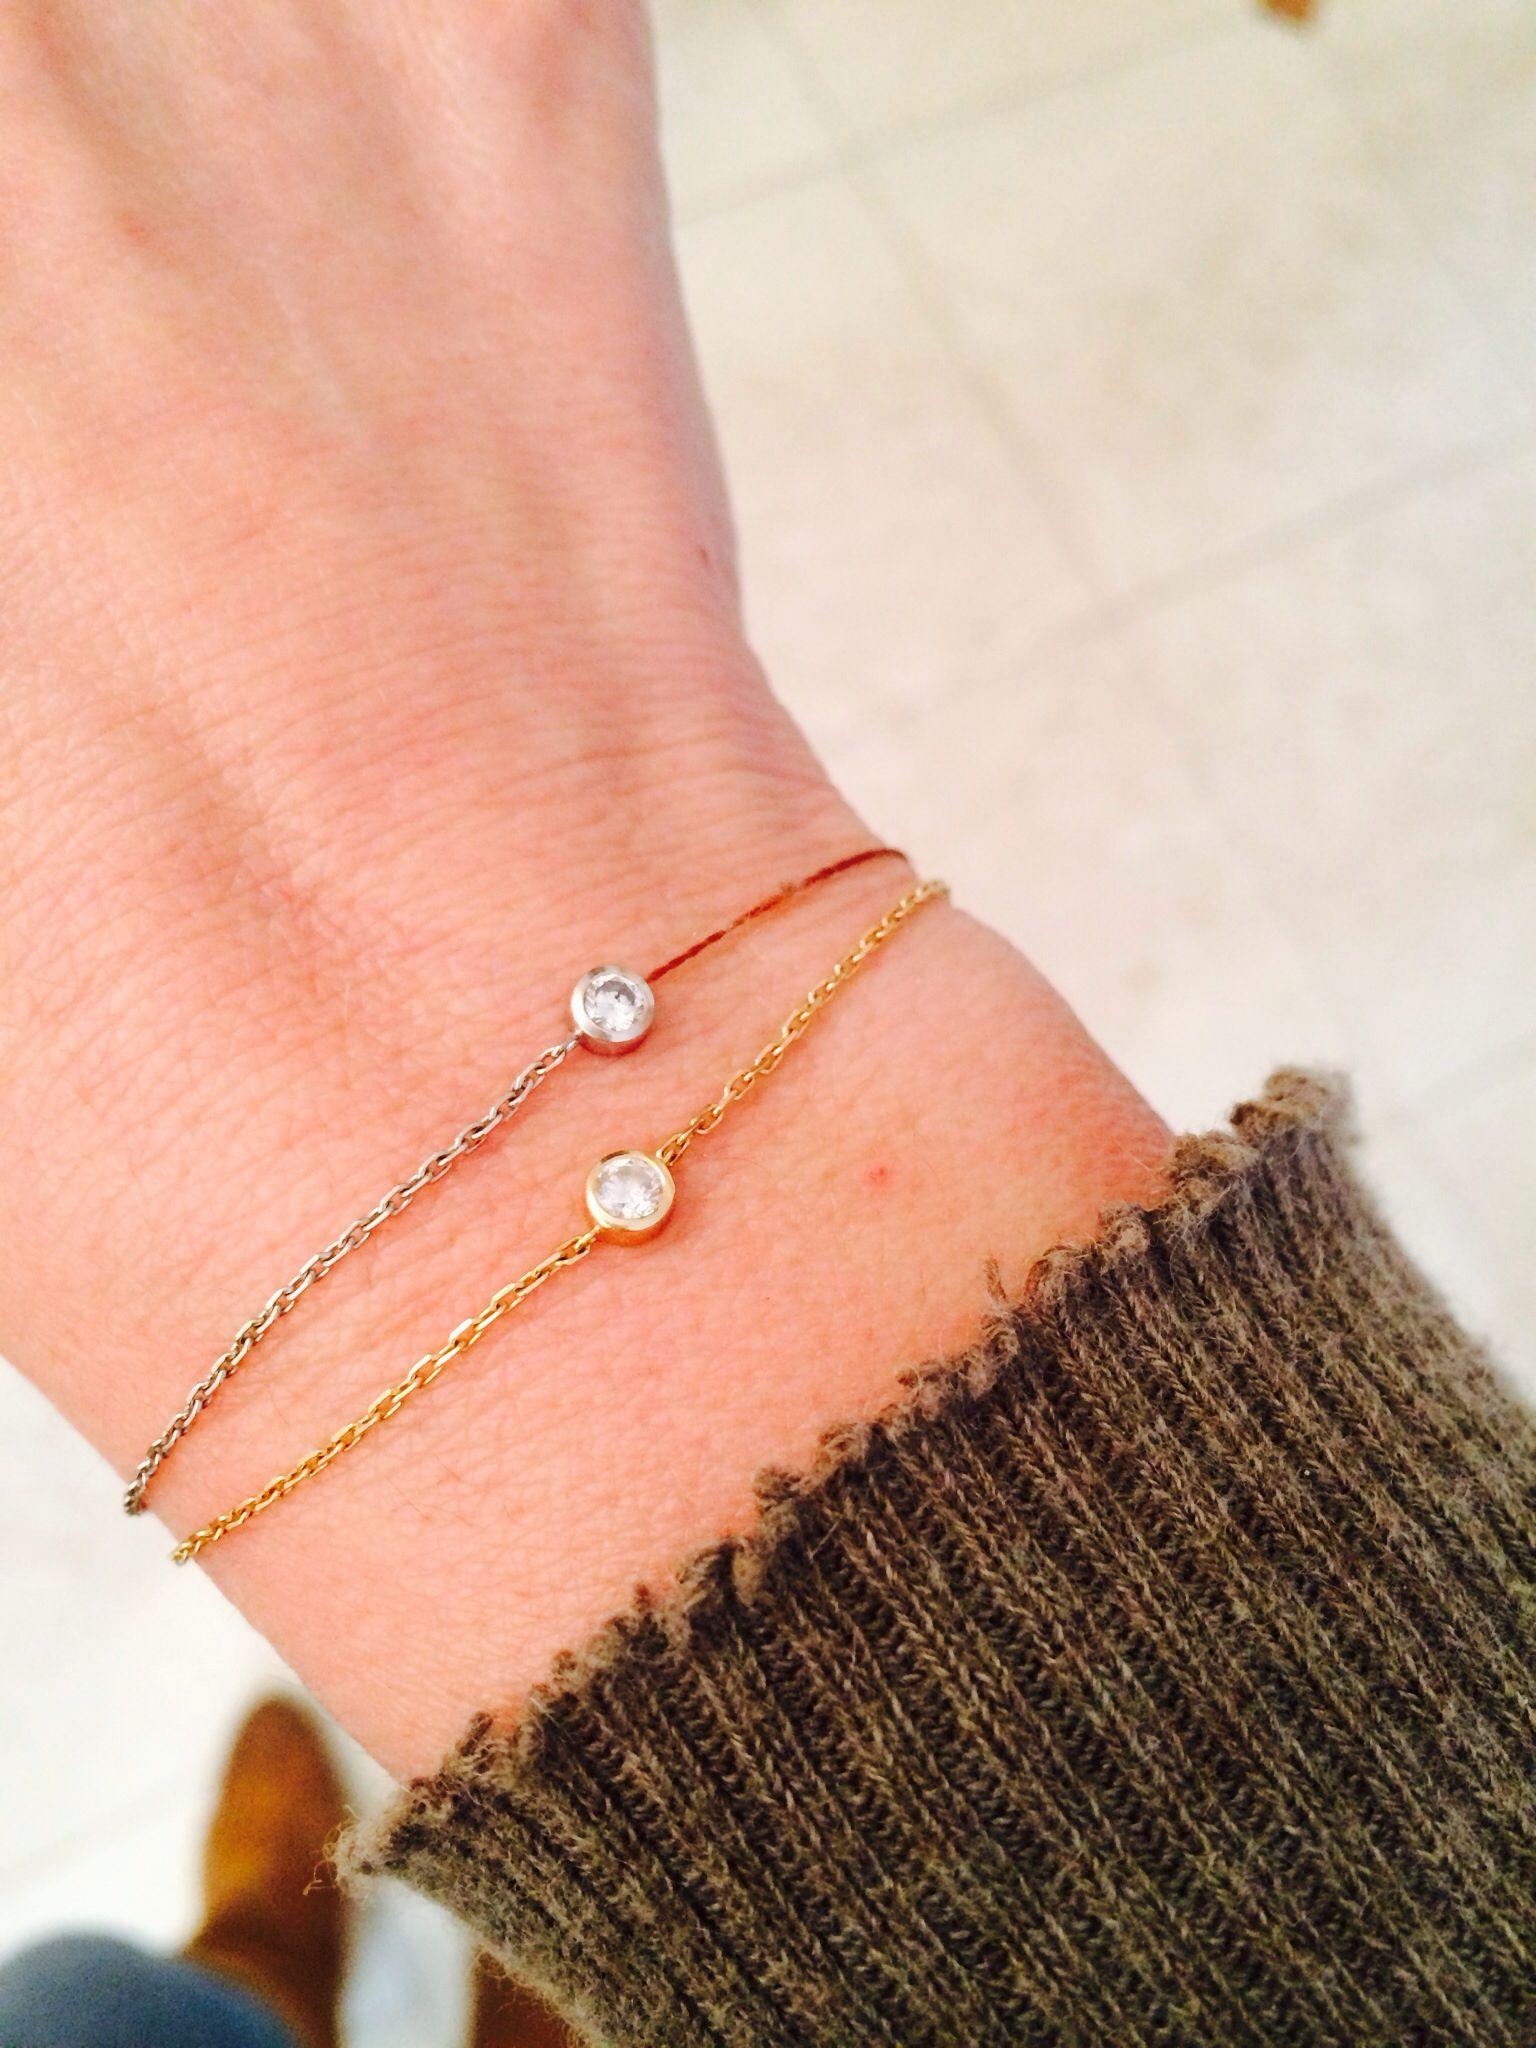 My two favorite bracelets by redLine. I never take these off. Redline-boutique.com